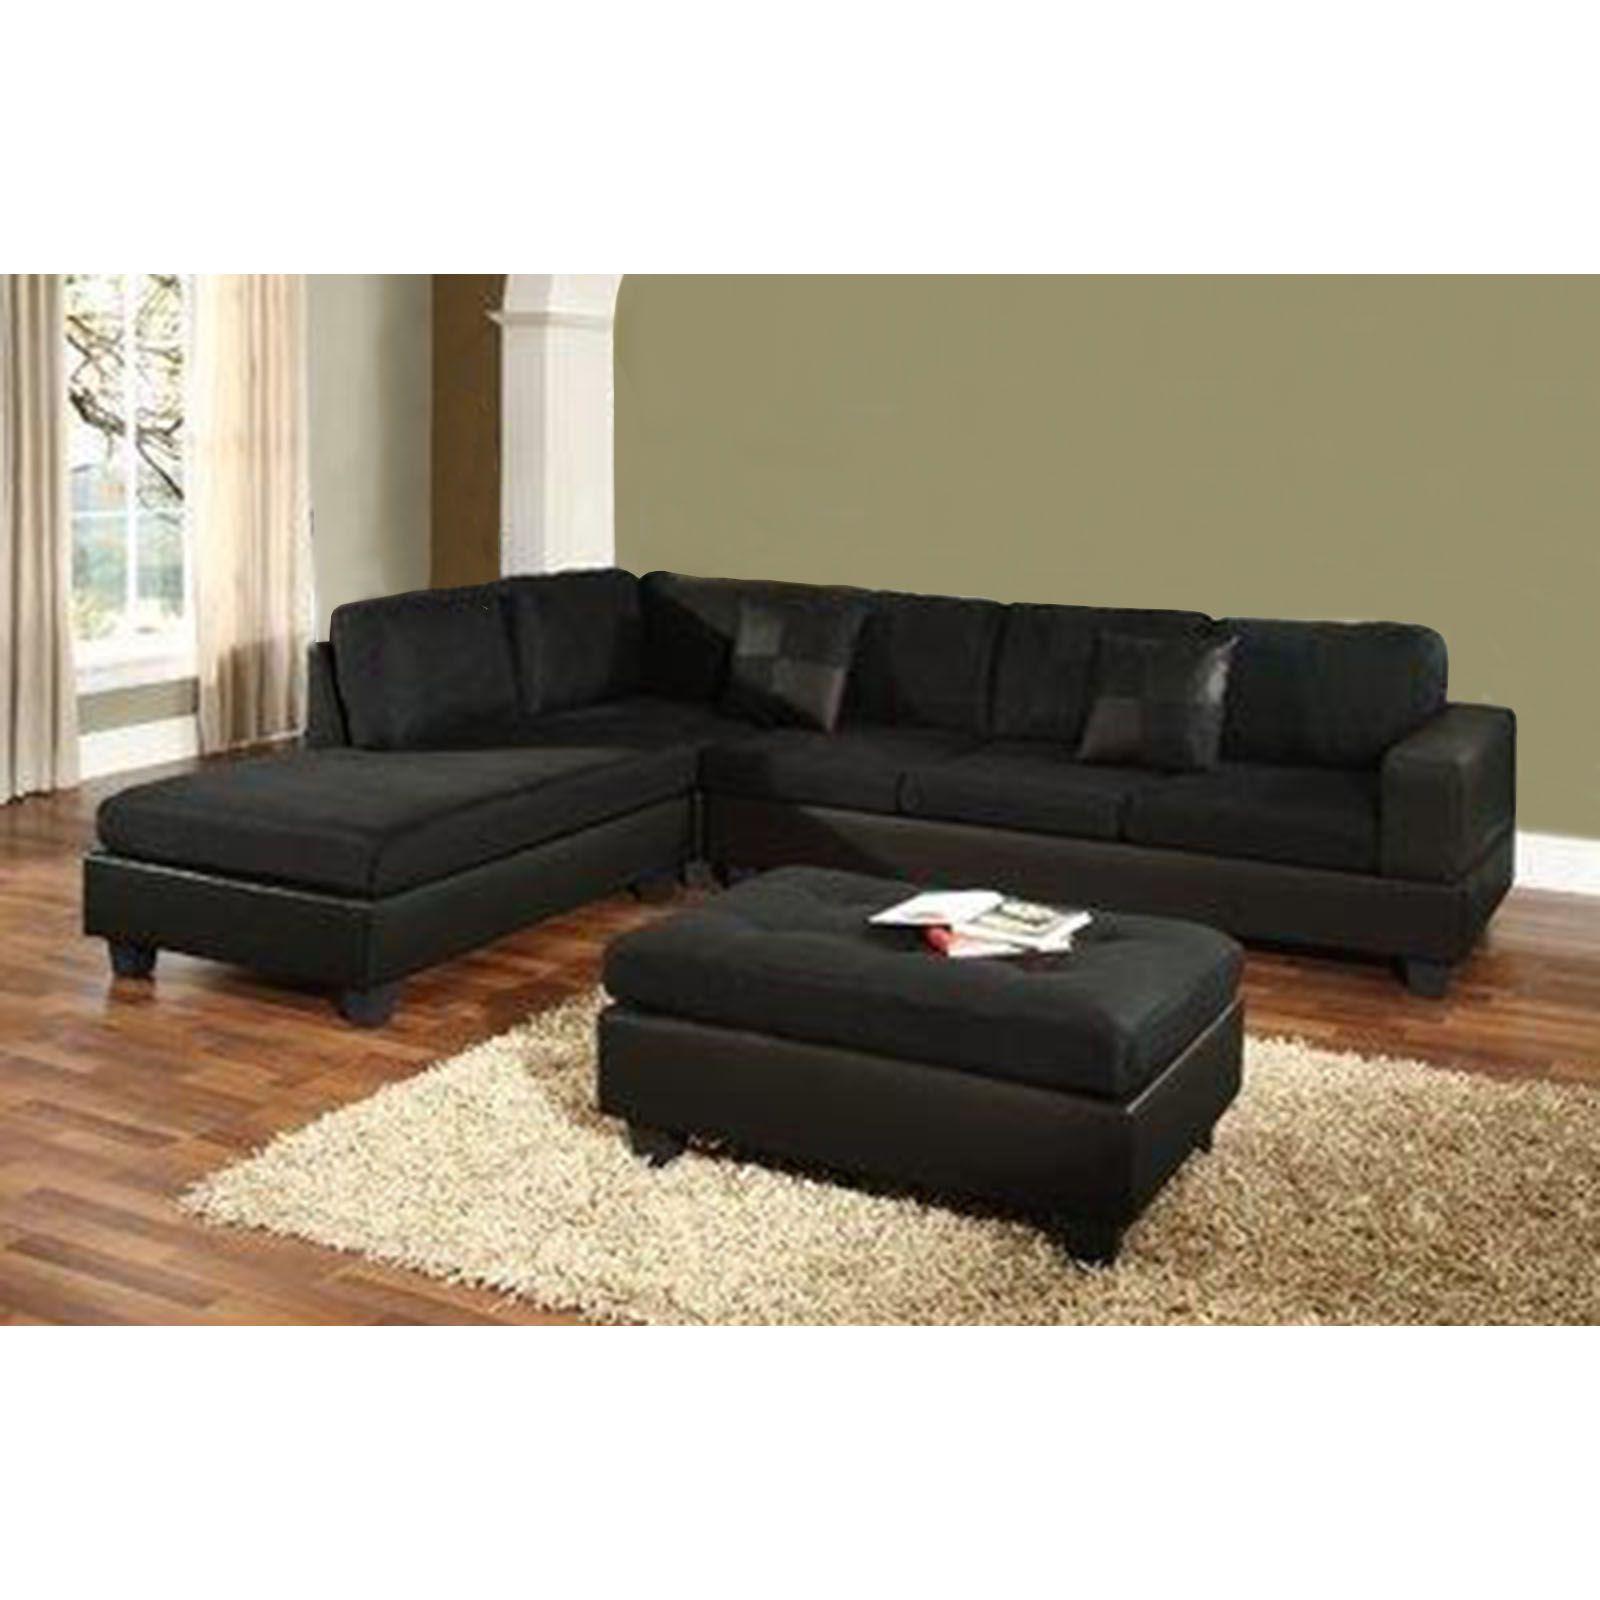 Venetian Worldwide Dallin Sectional Sofa Black Right Furniture Mattresses Living Room Furniture Sofas Black Sofa Sectional Sofa Mattress Furniture #sears #living #room #furniture